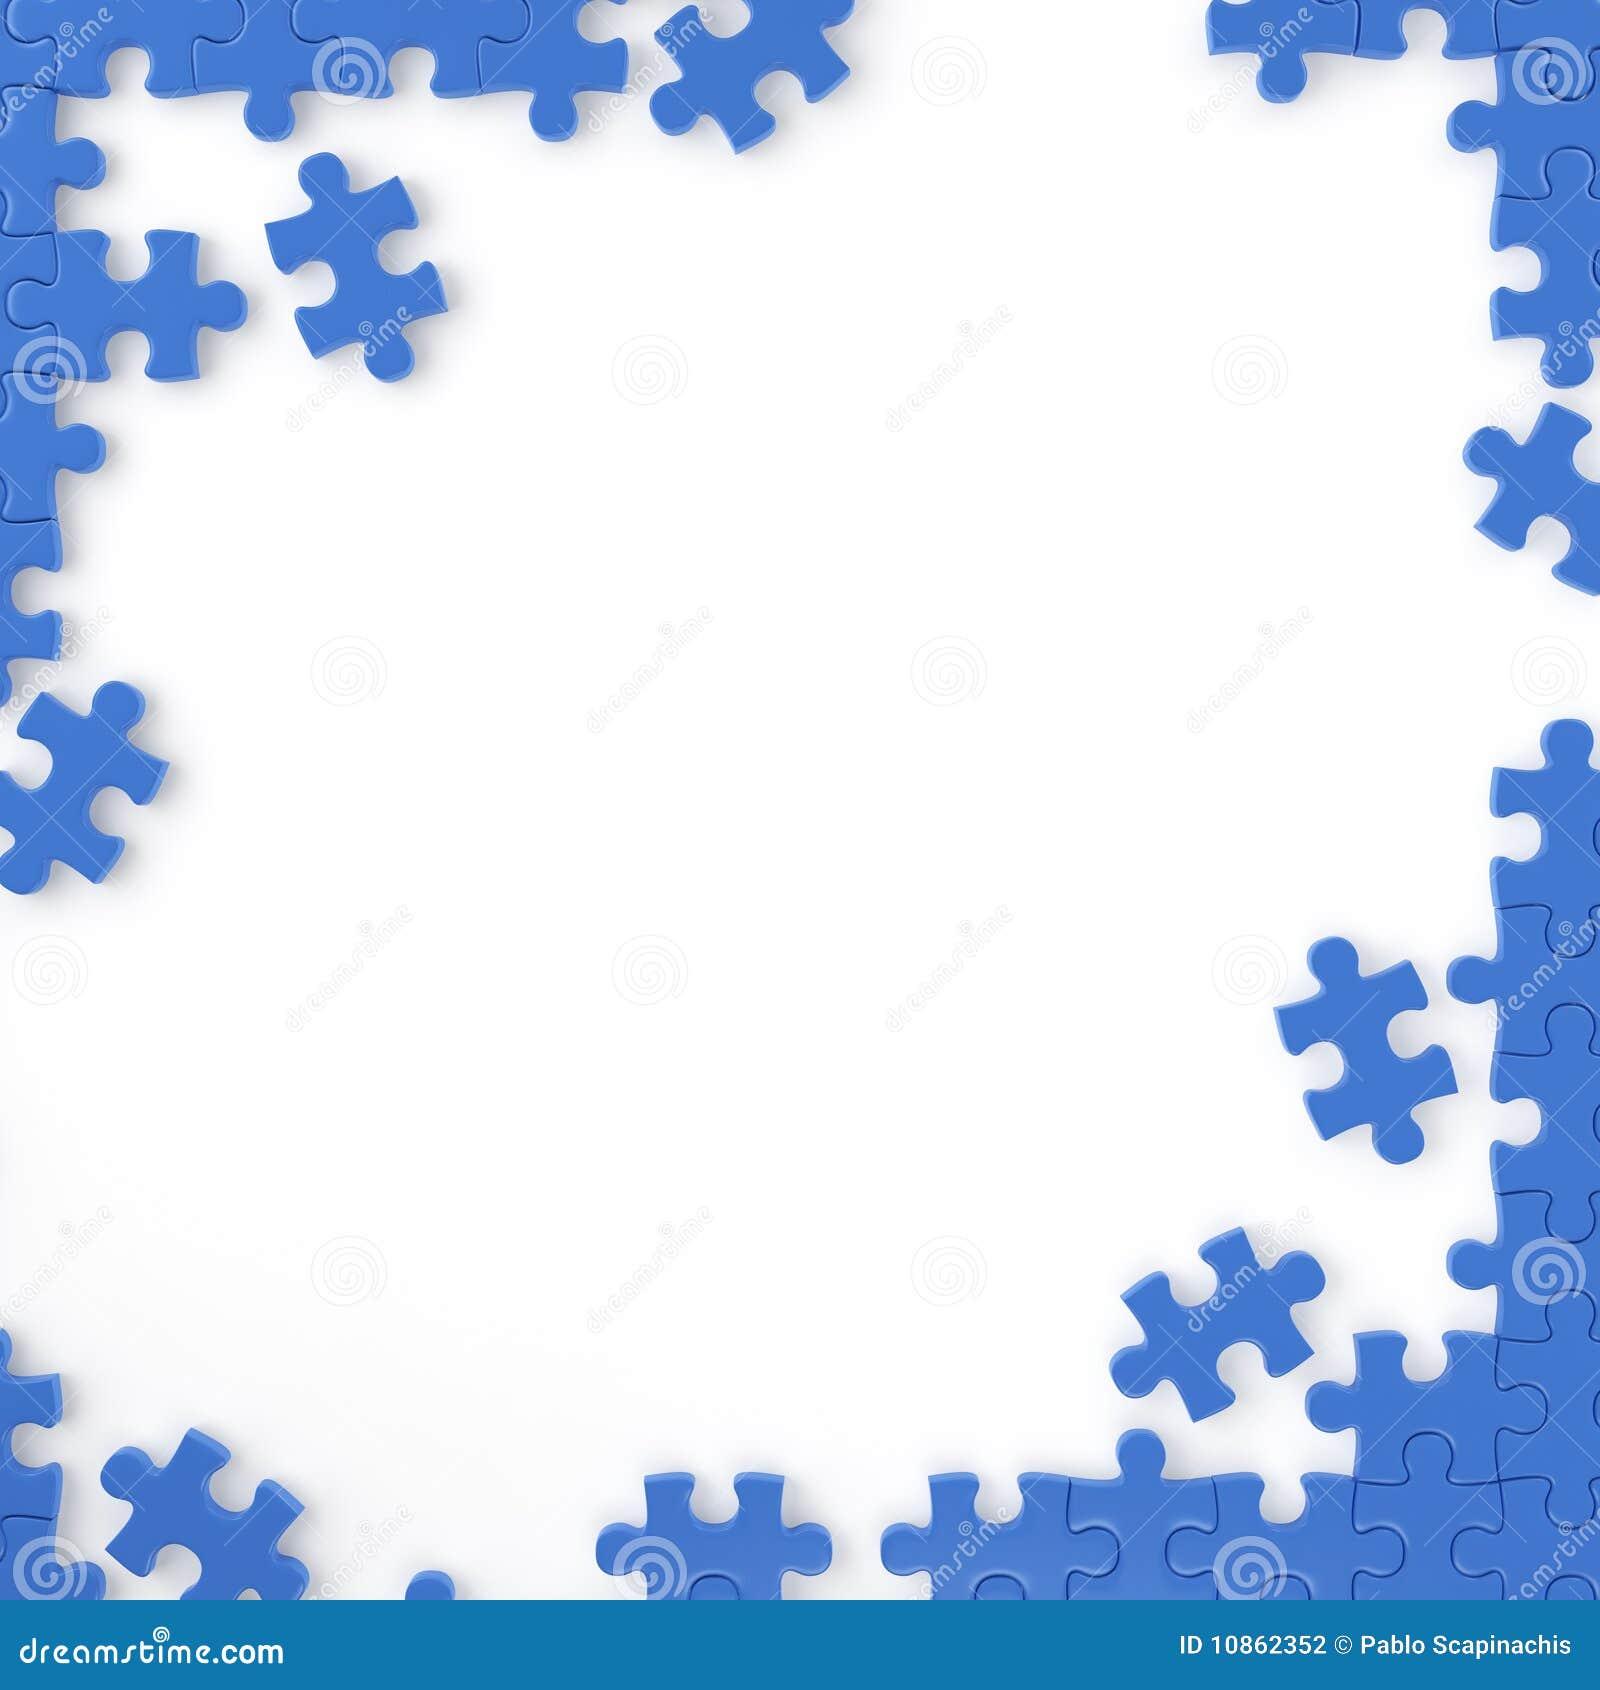 Puzzle frame stock illustration. Illustration of join - 10862352